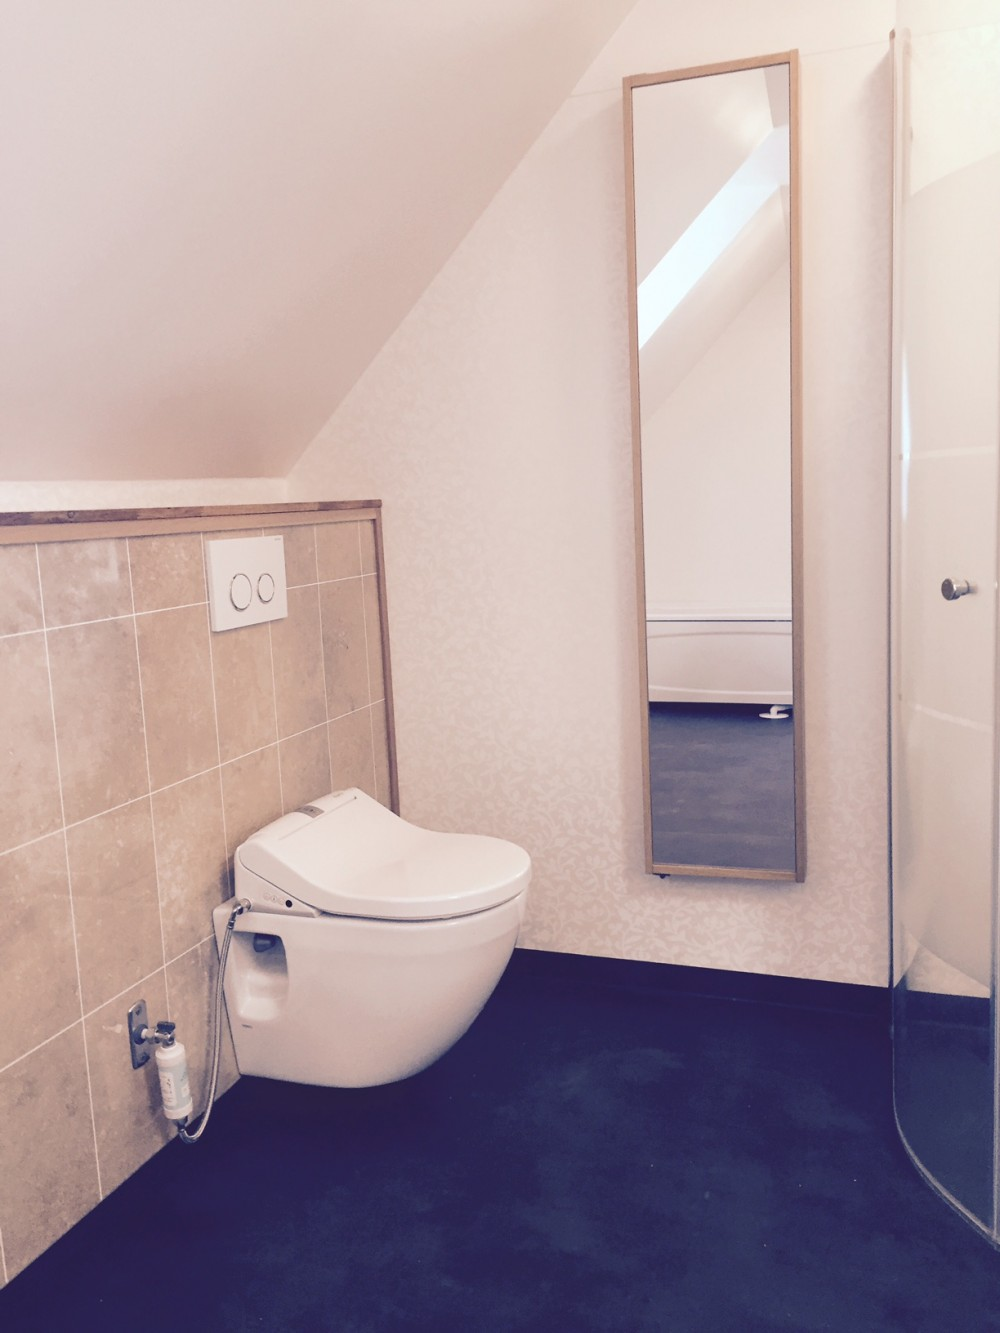 TOTO NC cw762y maro d'italia di600 dusch wc - wc dusche tooaleta aqua clean